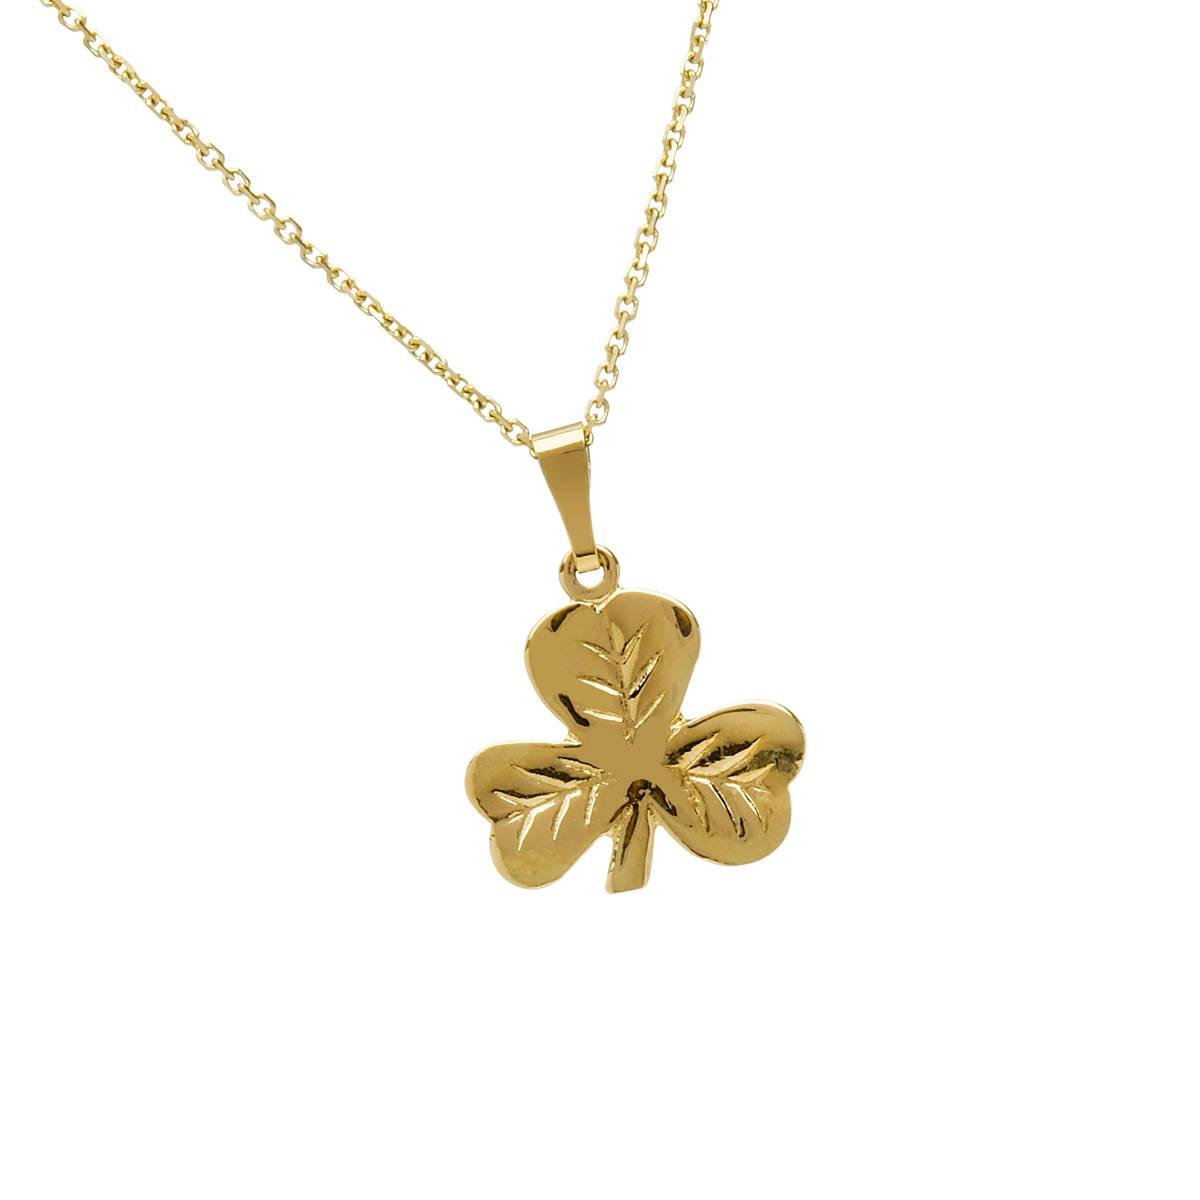 "10 carat yellow gold shamrock pendant on 18"" chain."